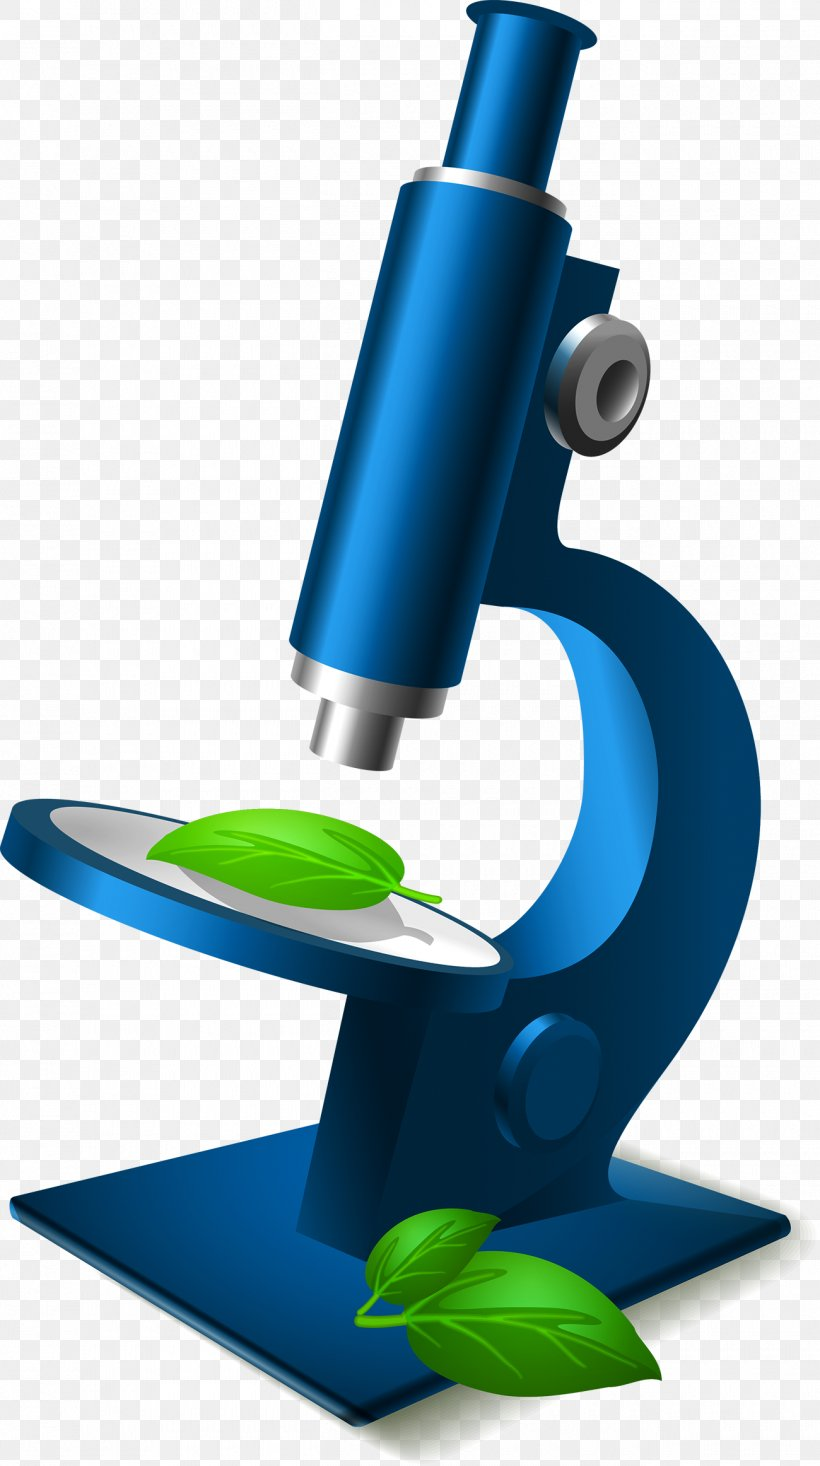 Microscope Euclidean Vector Clip Art, PNG, 1300x2325px, Microscope, Button, Clip Art, Illustration, Laboratory Download Free